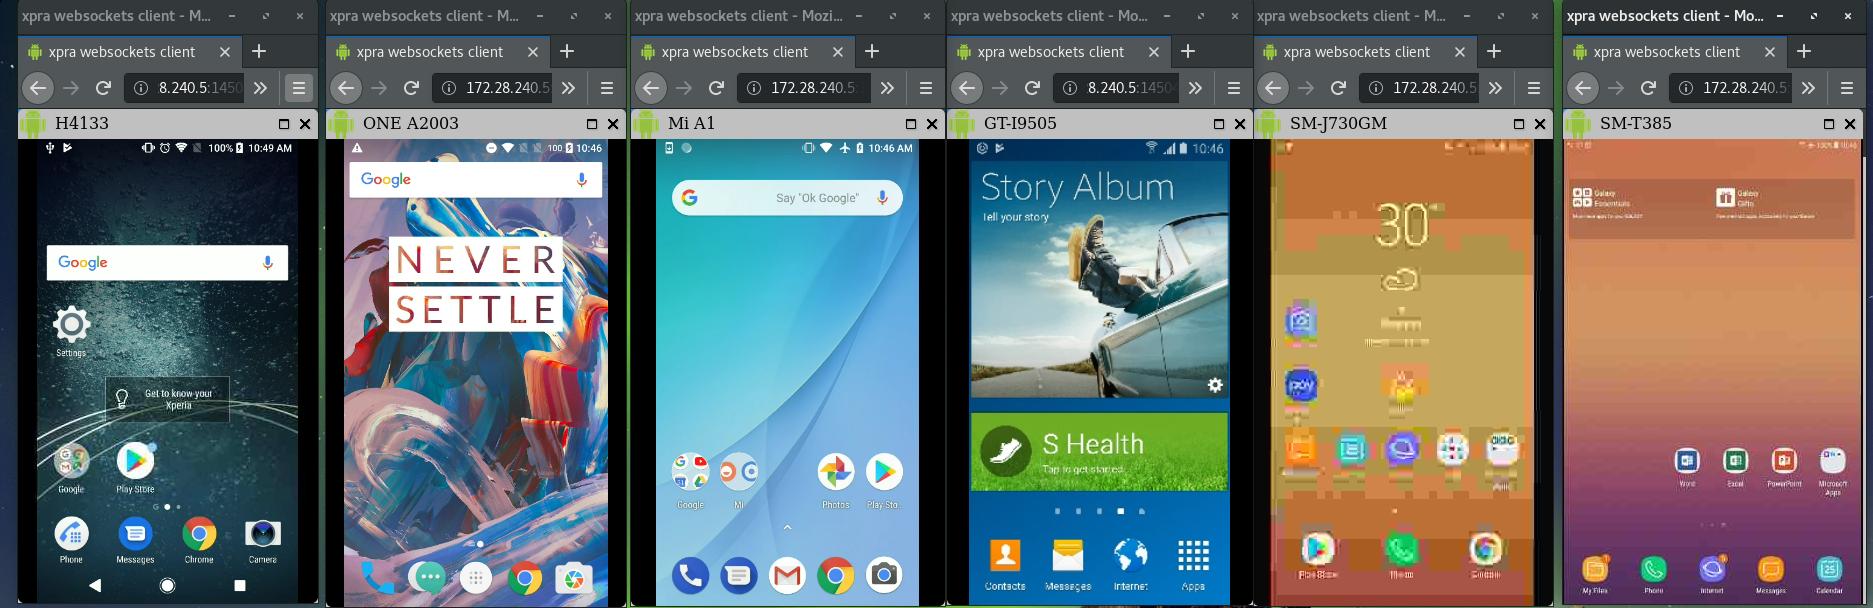 Screenshot of multiple devices displayed on web brpwser